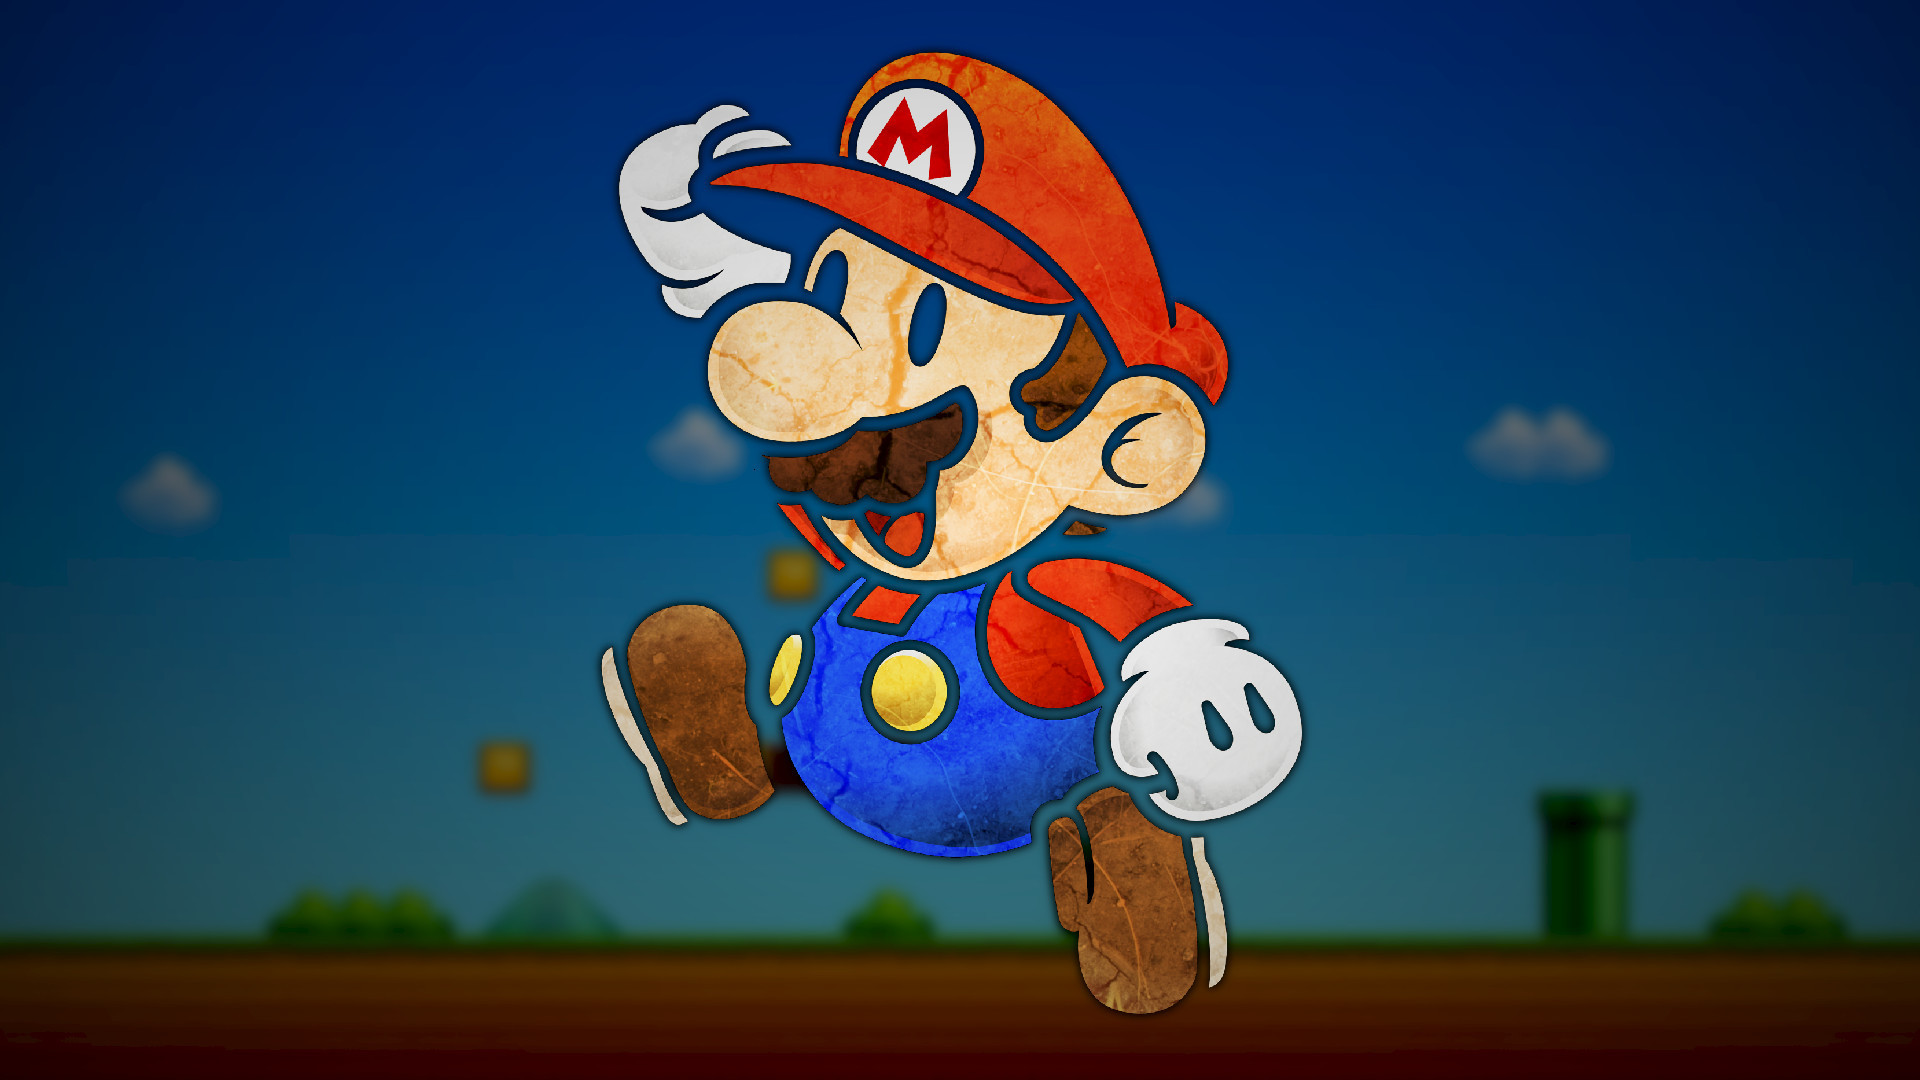 Nintendo Wallpapers 79 Pictures